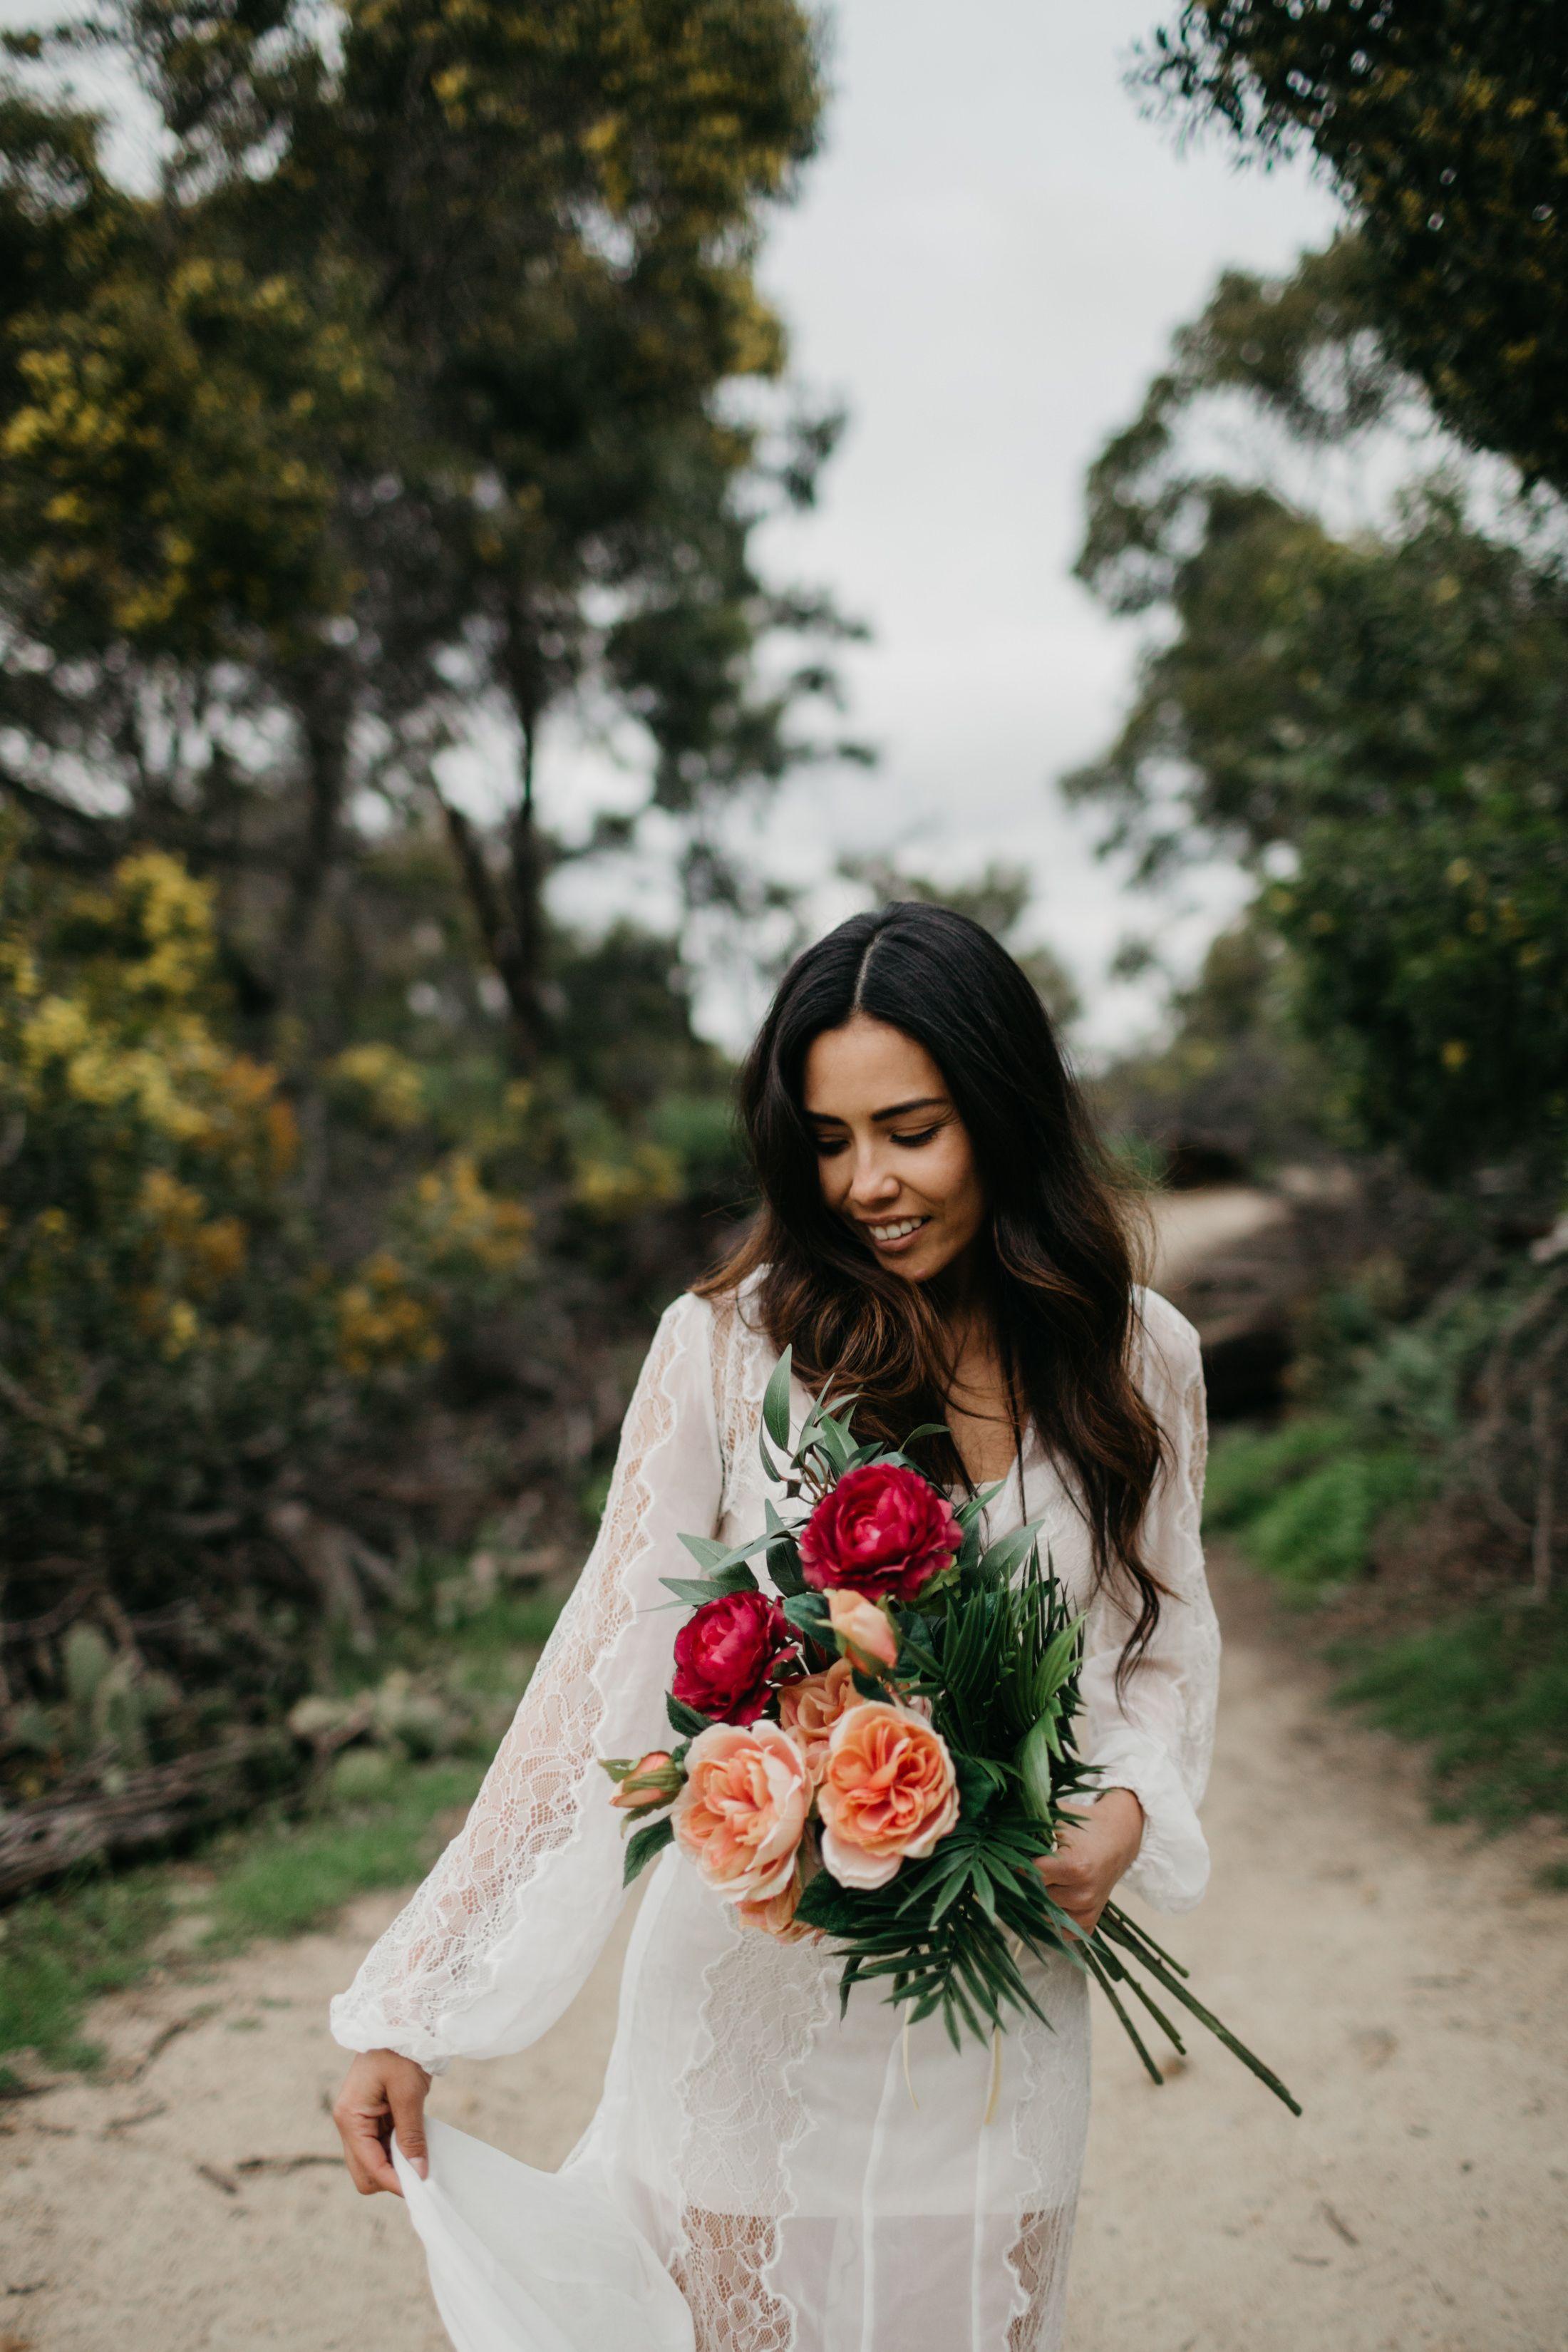 Lagoon San Diego Solana Beach Cardiff San Elijo Engagement Love Shoot Stone Fox Bride - Martina Micko Elopement Photographer